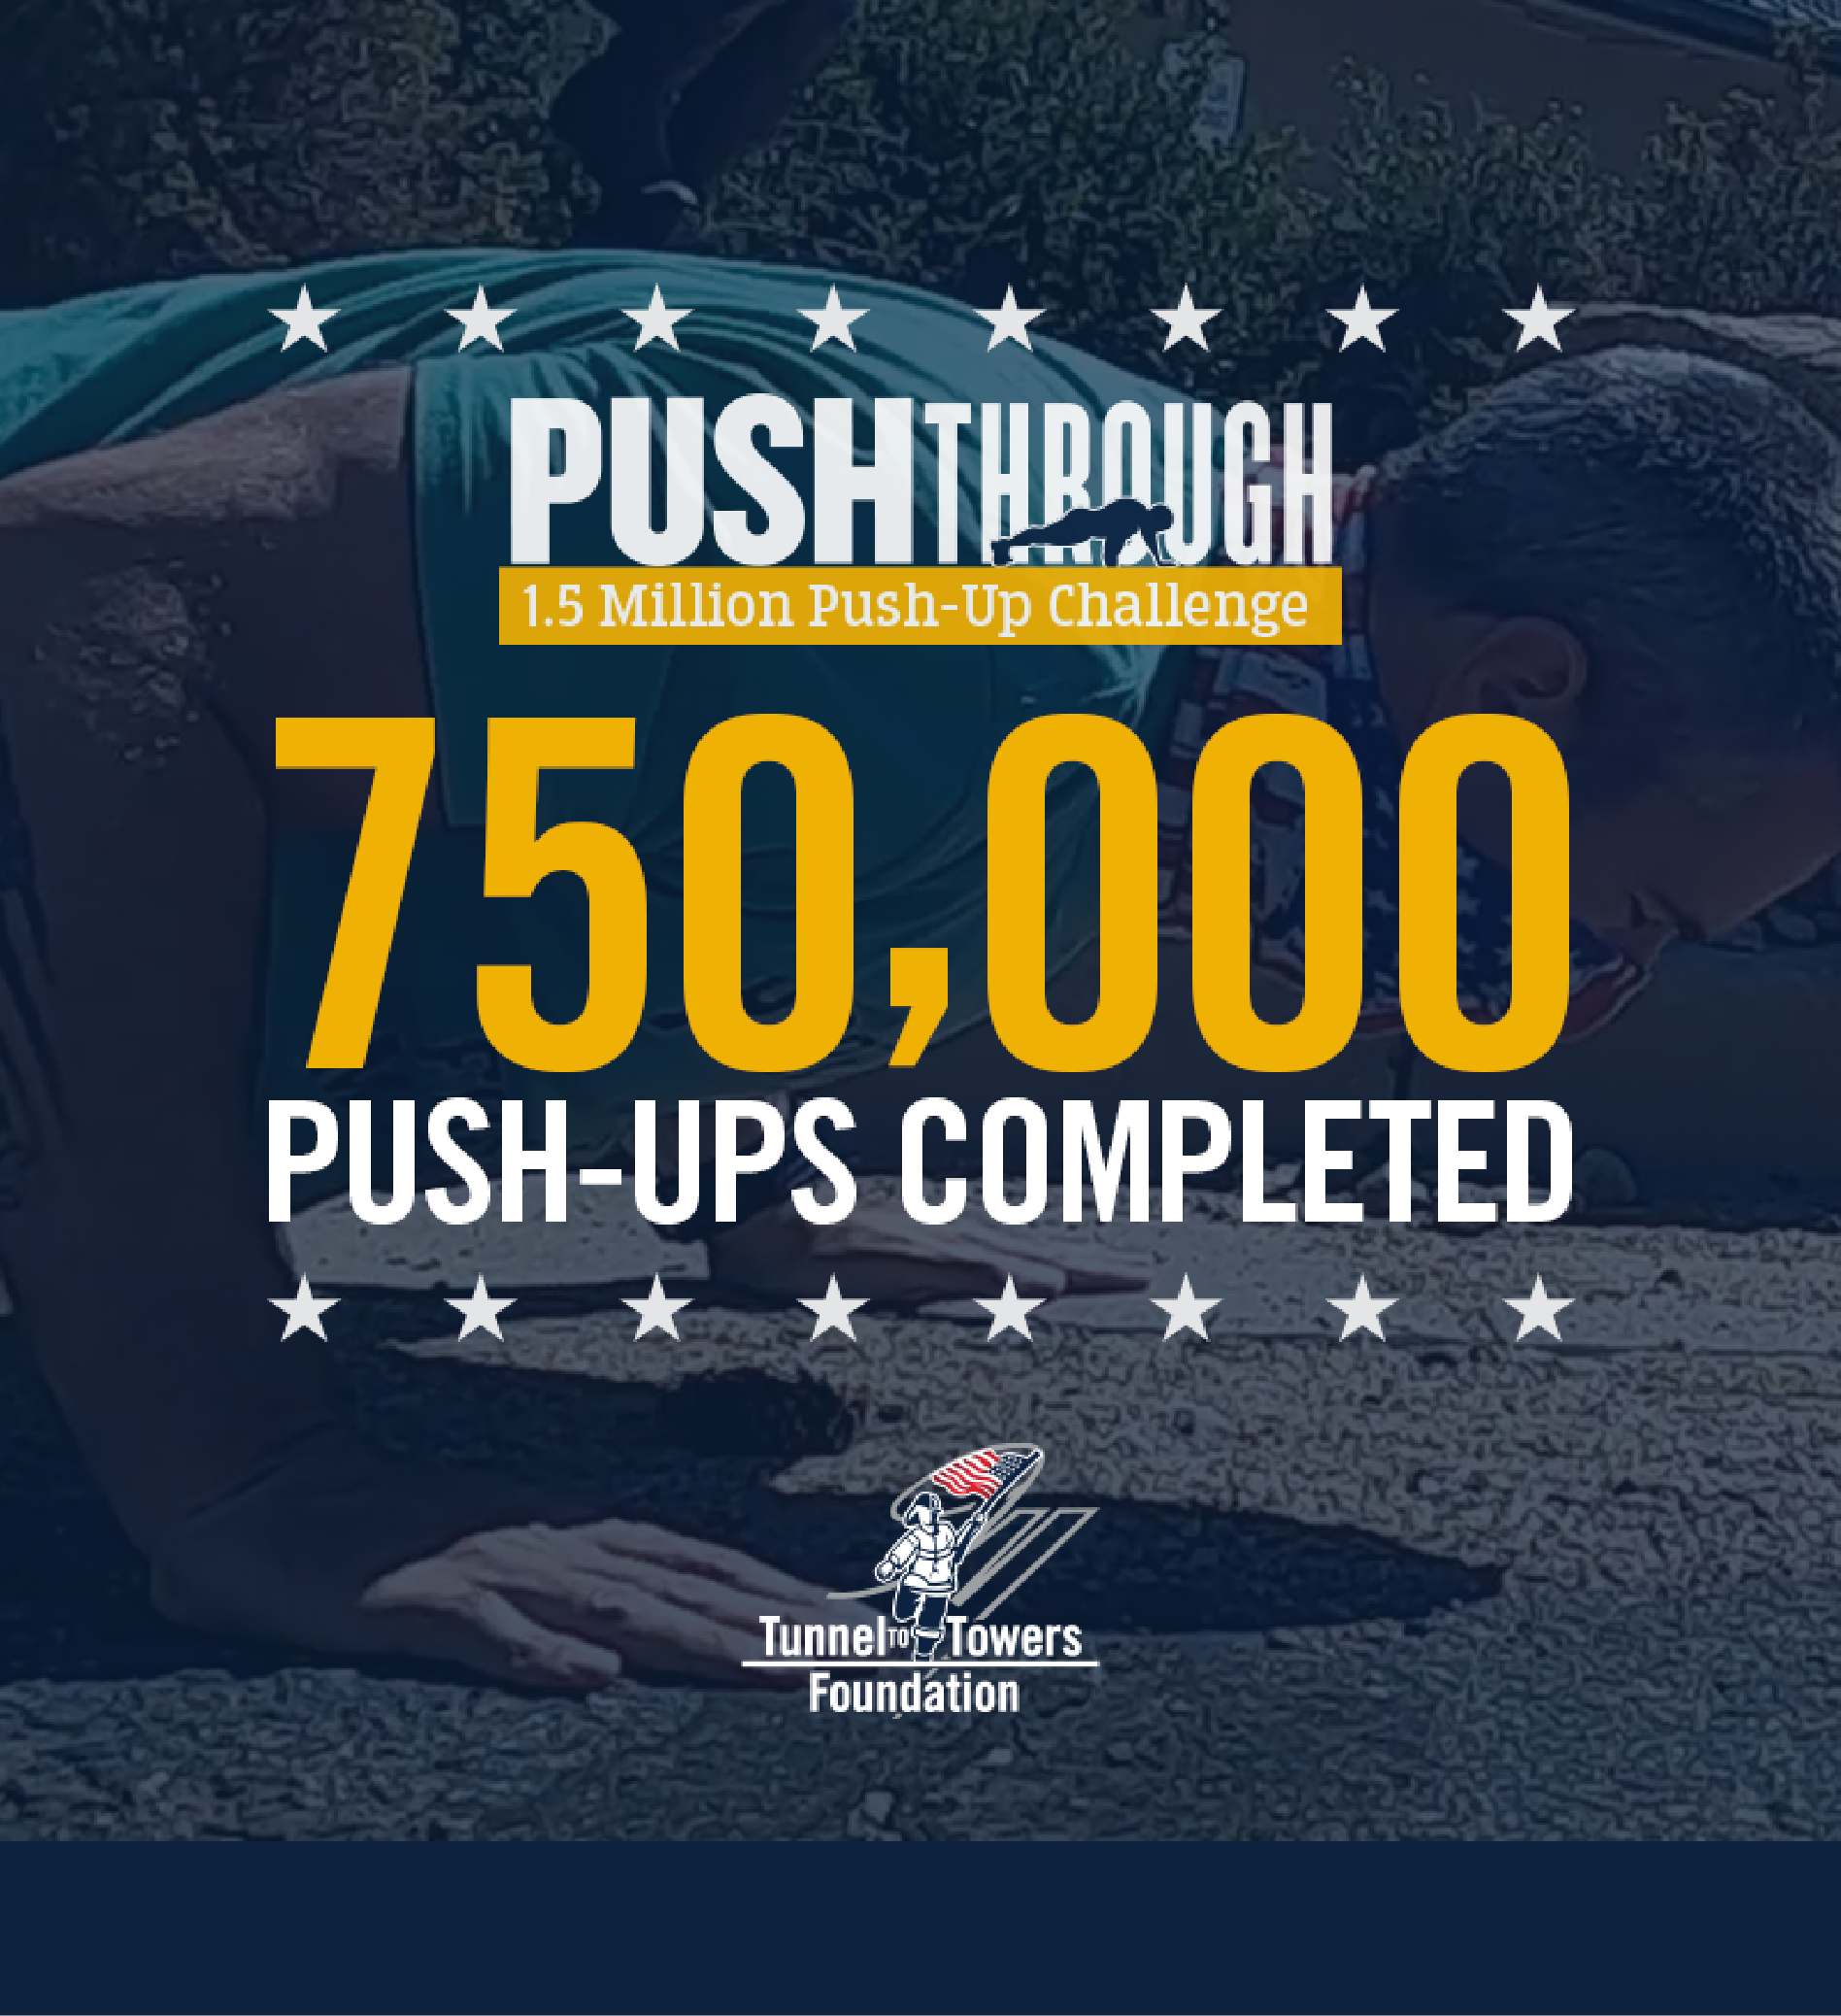 1.5 Million Push-up Challenge Photo